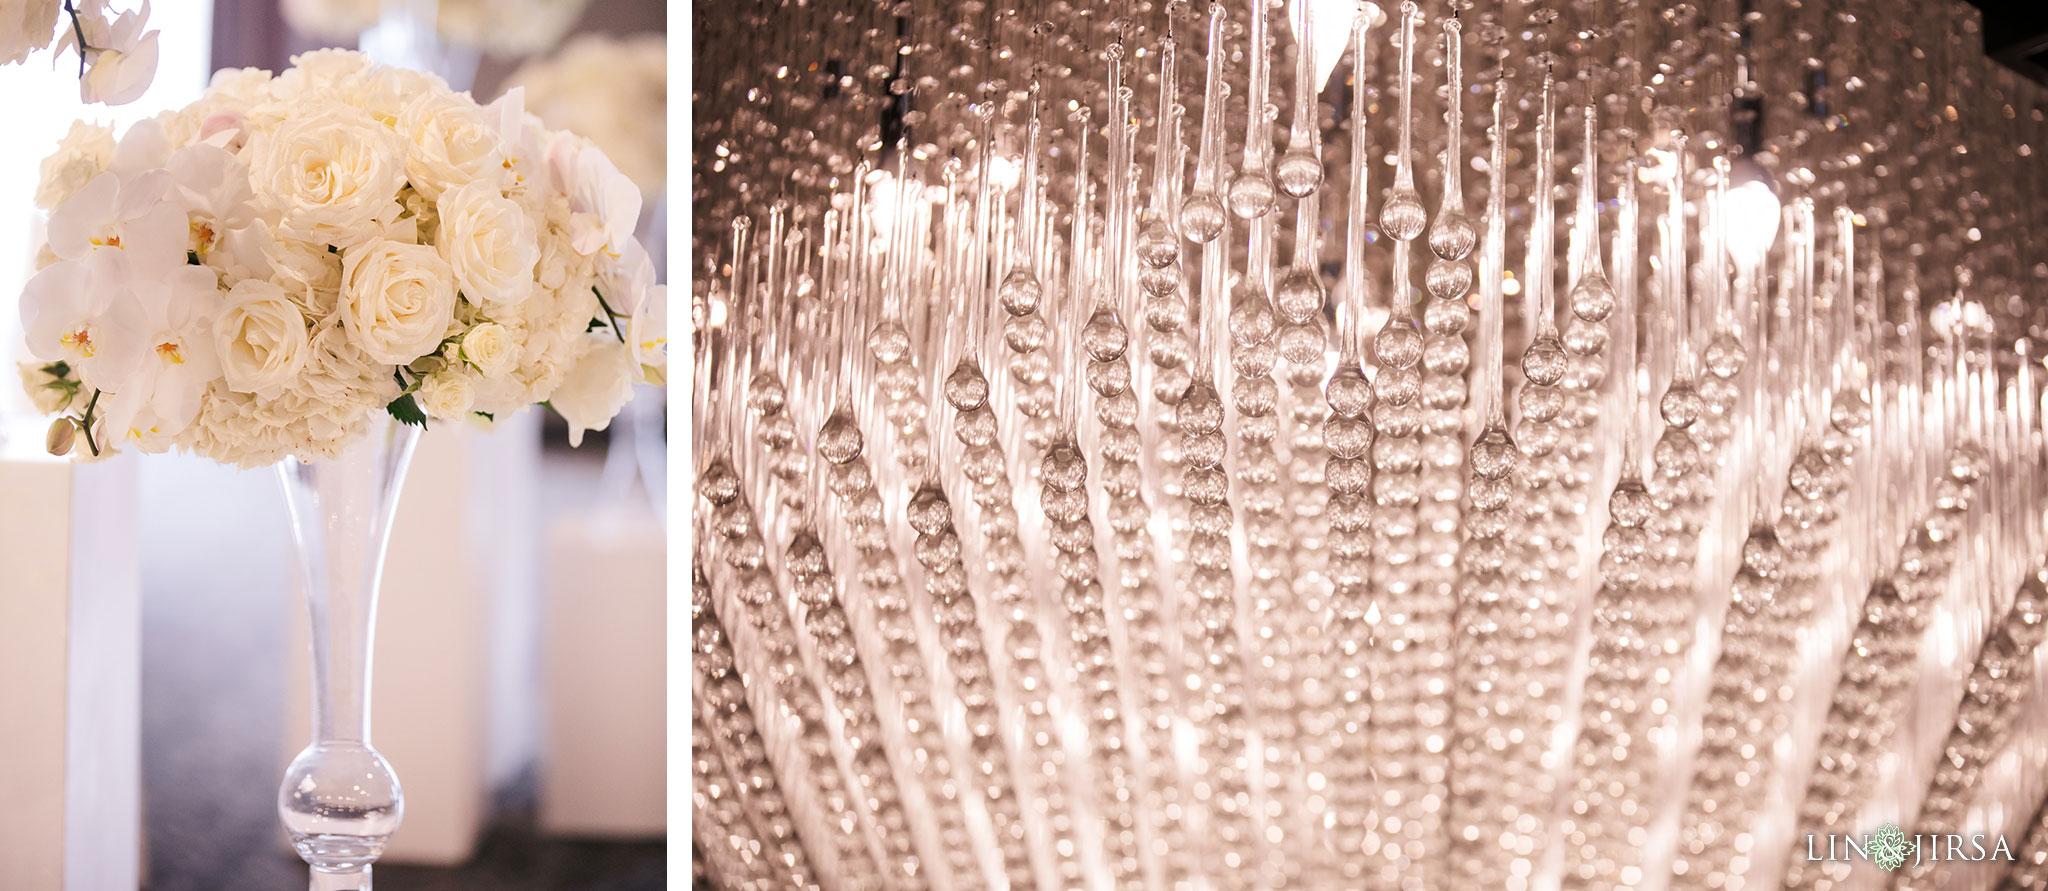 21 vertigo banquet hall glendale wedding photography